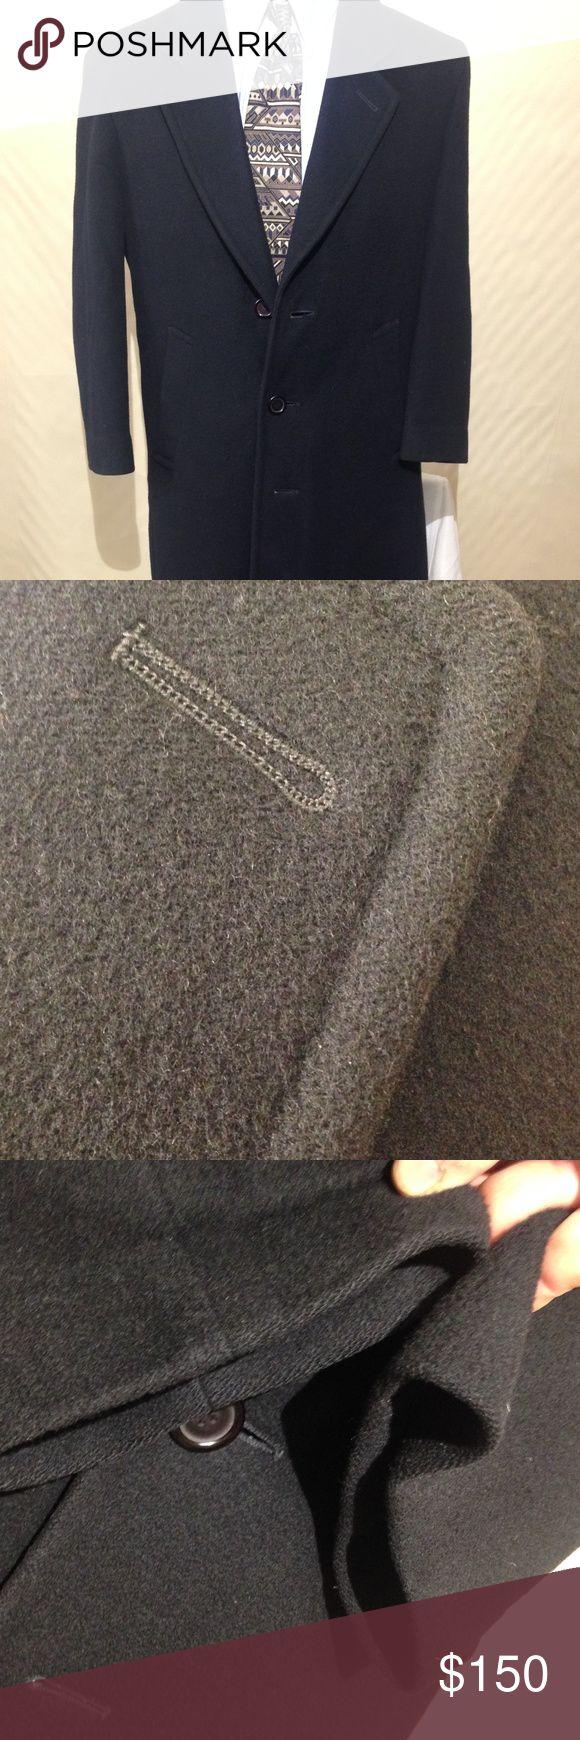 "Nino Cerruti Mens 36S 100% Wool Men's Black Coat Nino Cerruti Mens 36S Pure Wool Men's Black Overcoat-Winter Coat Button Down Size: 36s  Chest: 23""  Shoulders: 20""  Shoulder to Cuff: 22""  Armpit to Cuff: 15""  Length: 47""  Item Number: TC1135 Nino Cerruti Jackets & Coats Trench Coats"